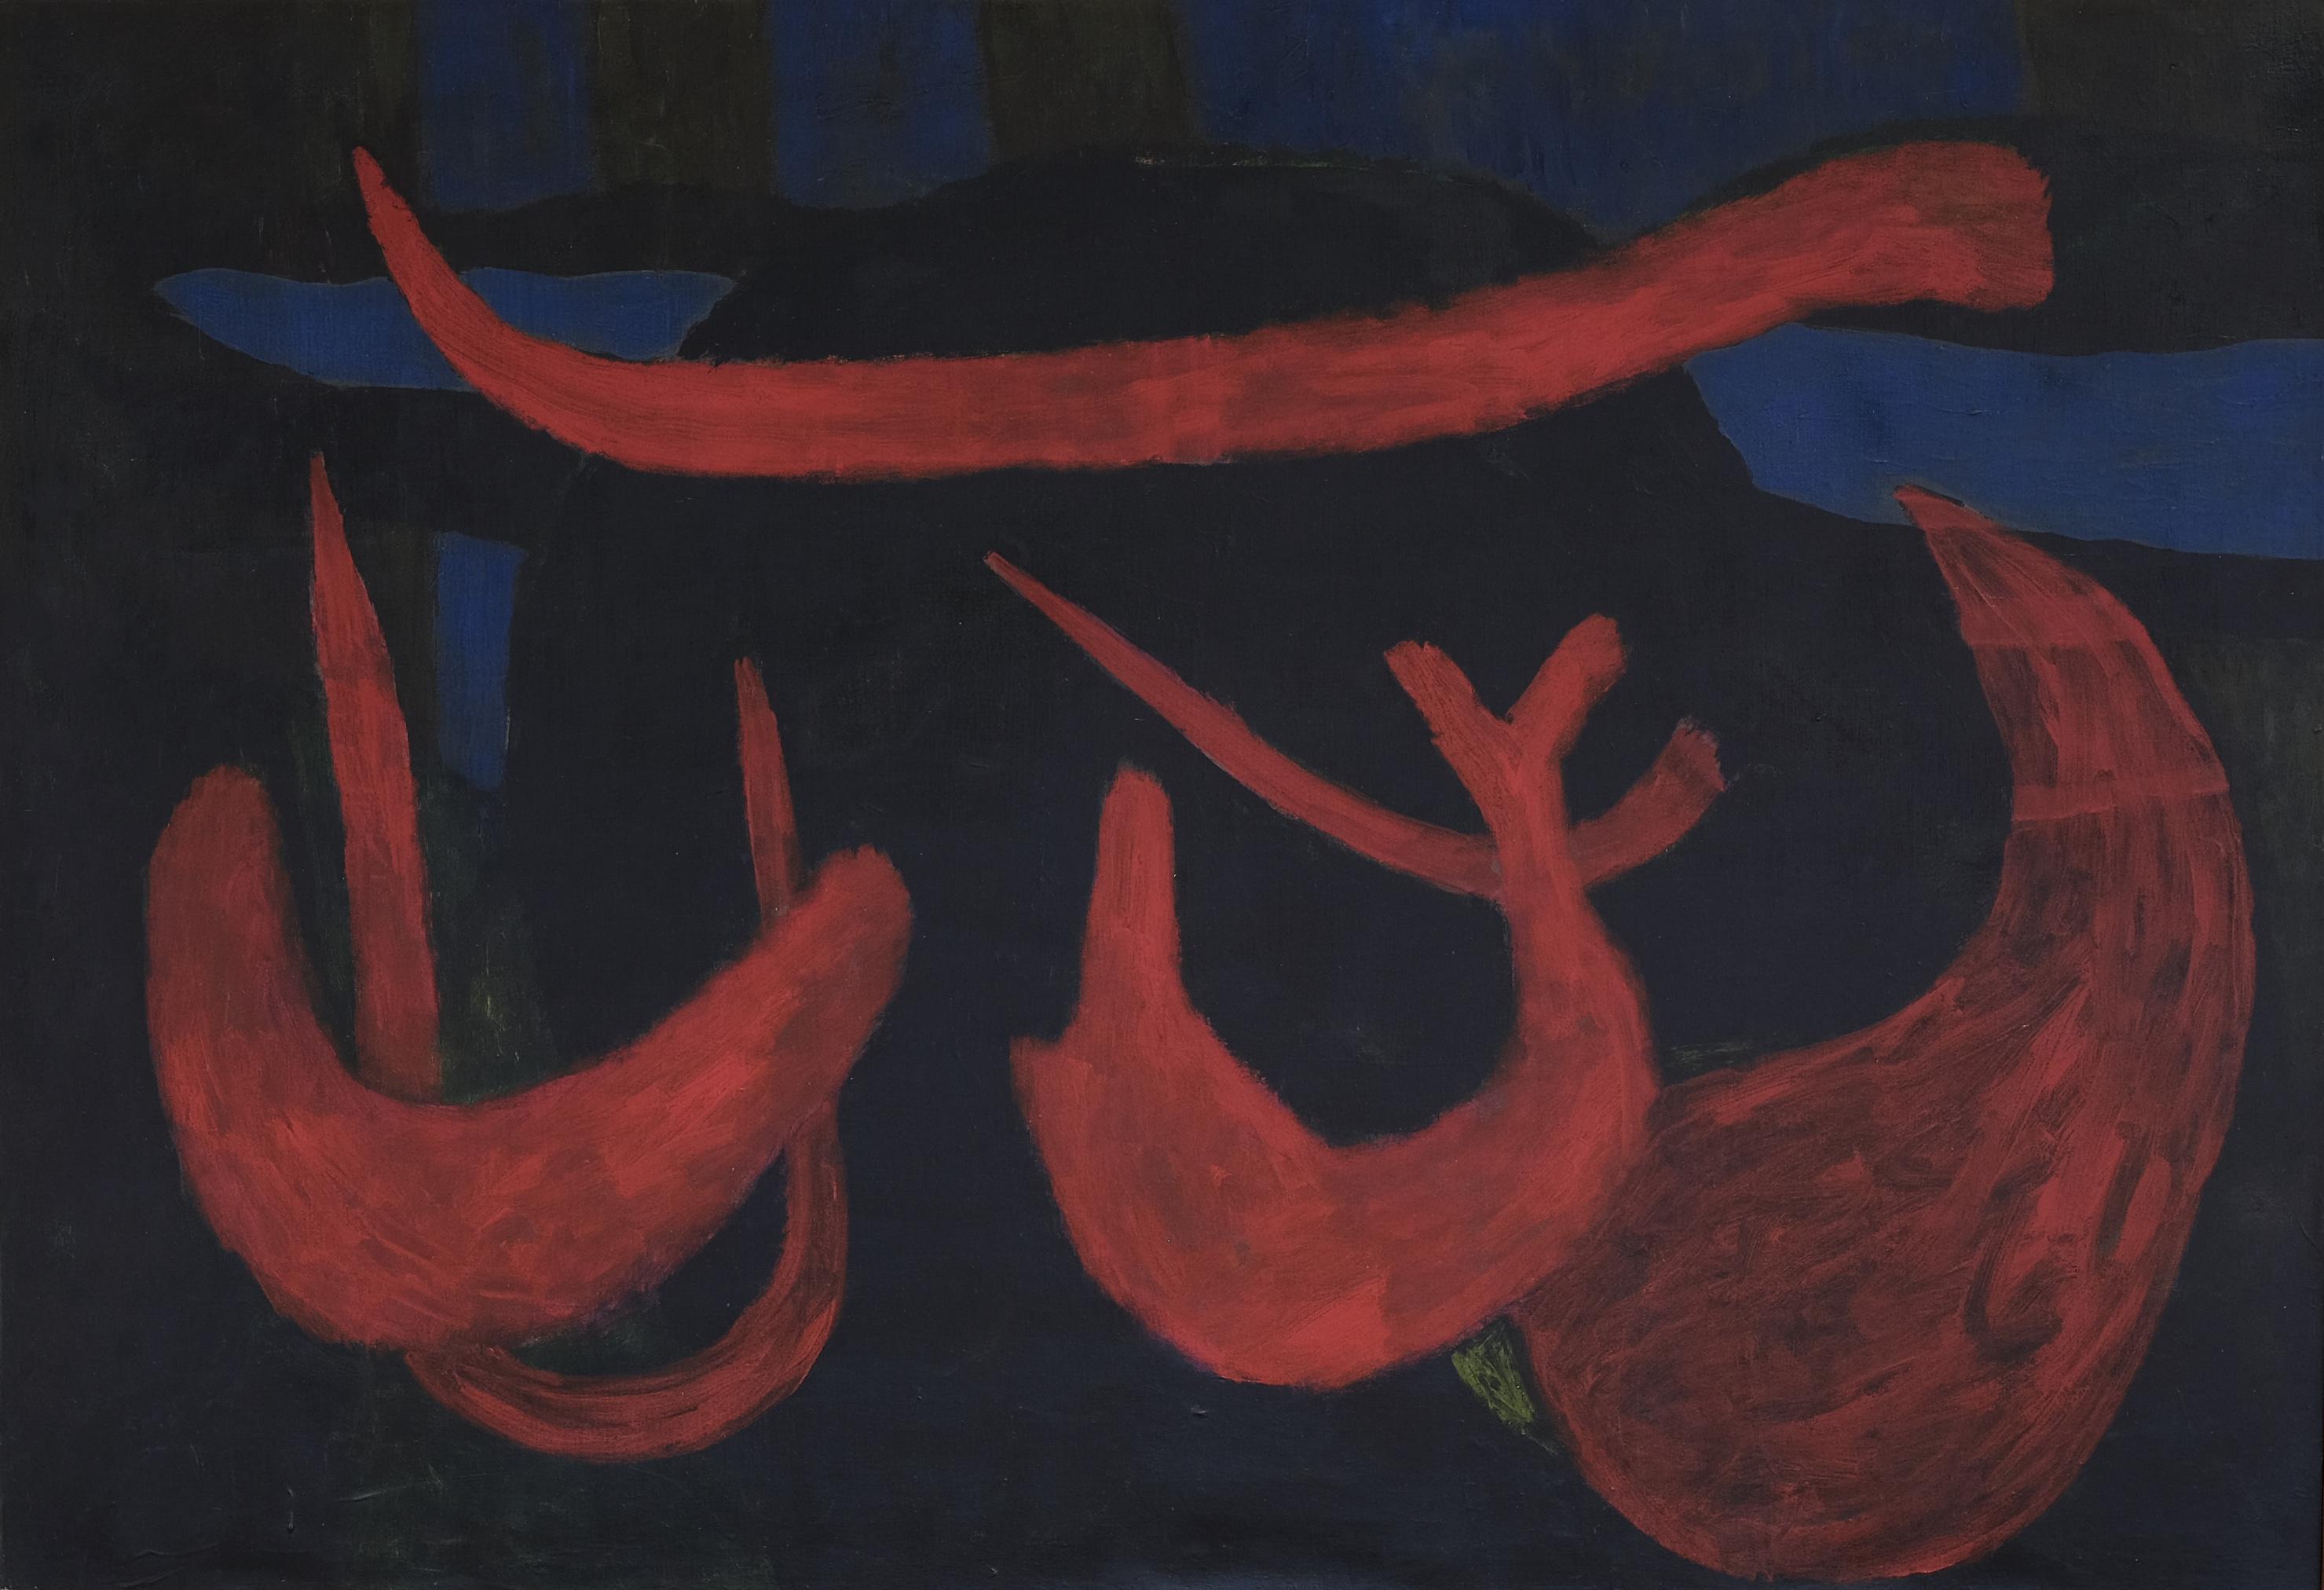 Nashar, Nyayian Malam (Night Song), oil on canvas, 88 x 127 cm, 1977